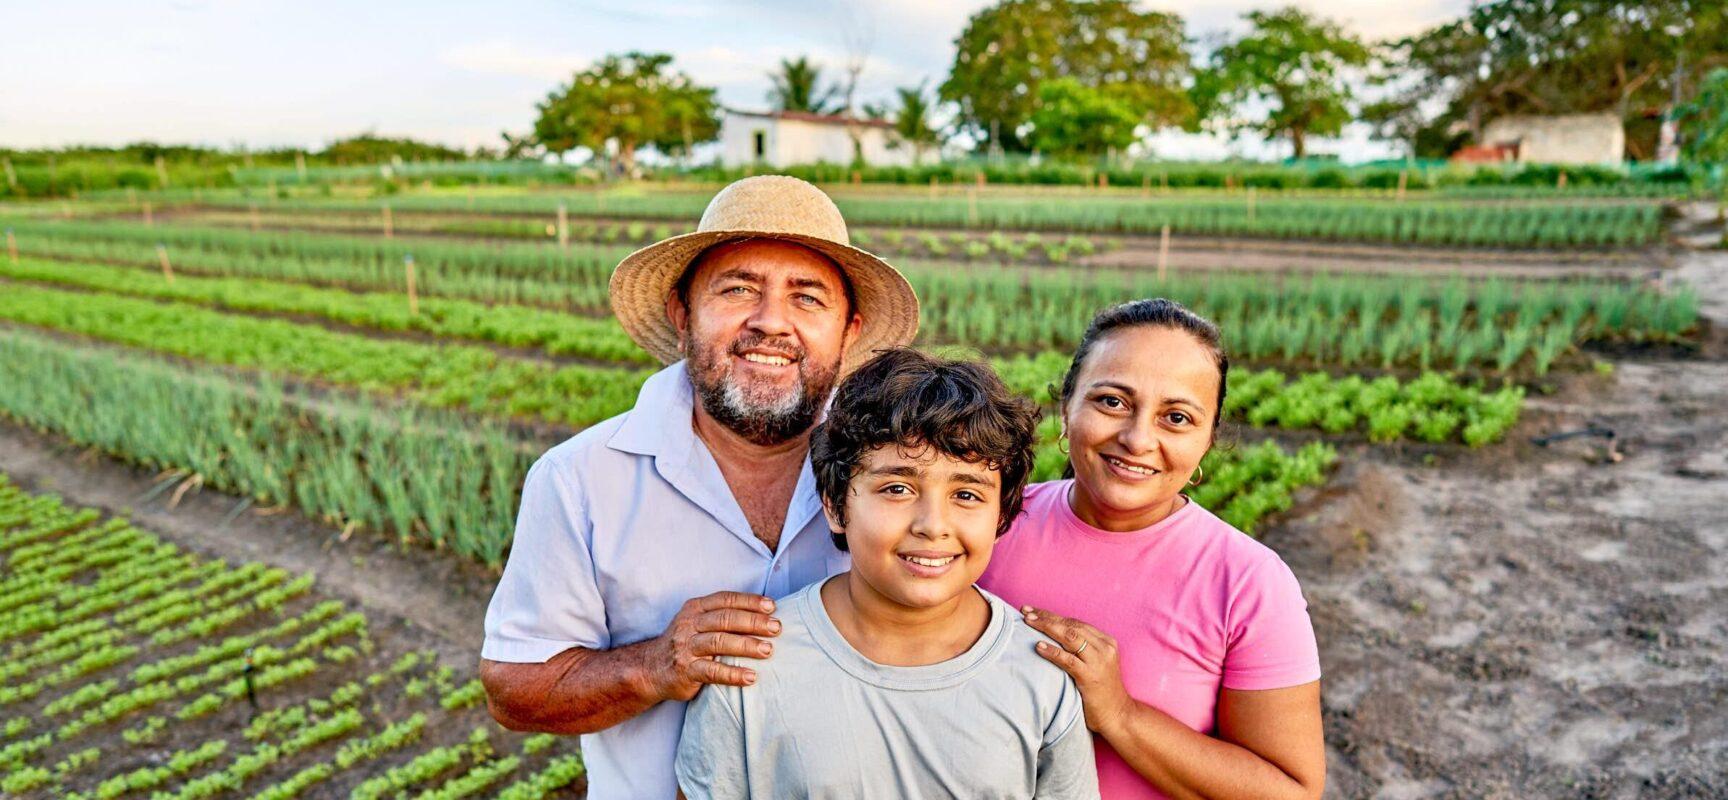 Governo do Estado e Consórcio Intermunicipal se unem para fortalecer a agricultura familiar no Médio Rio das Contas